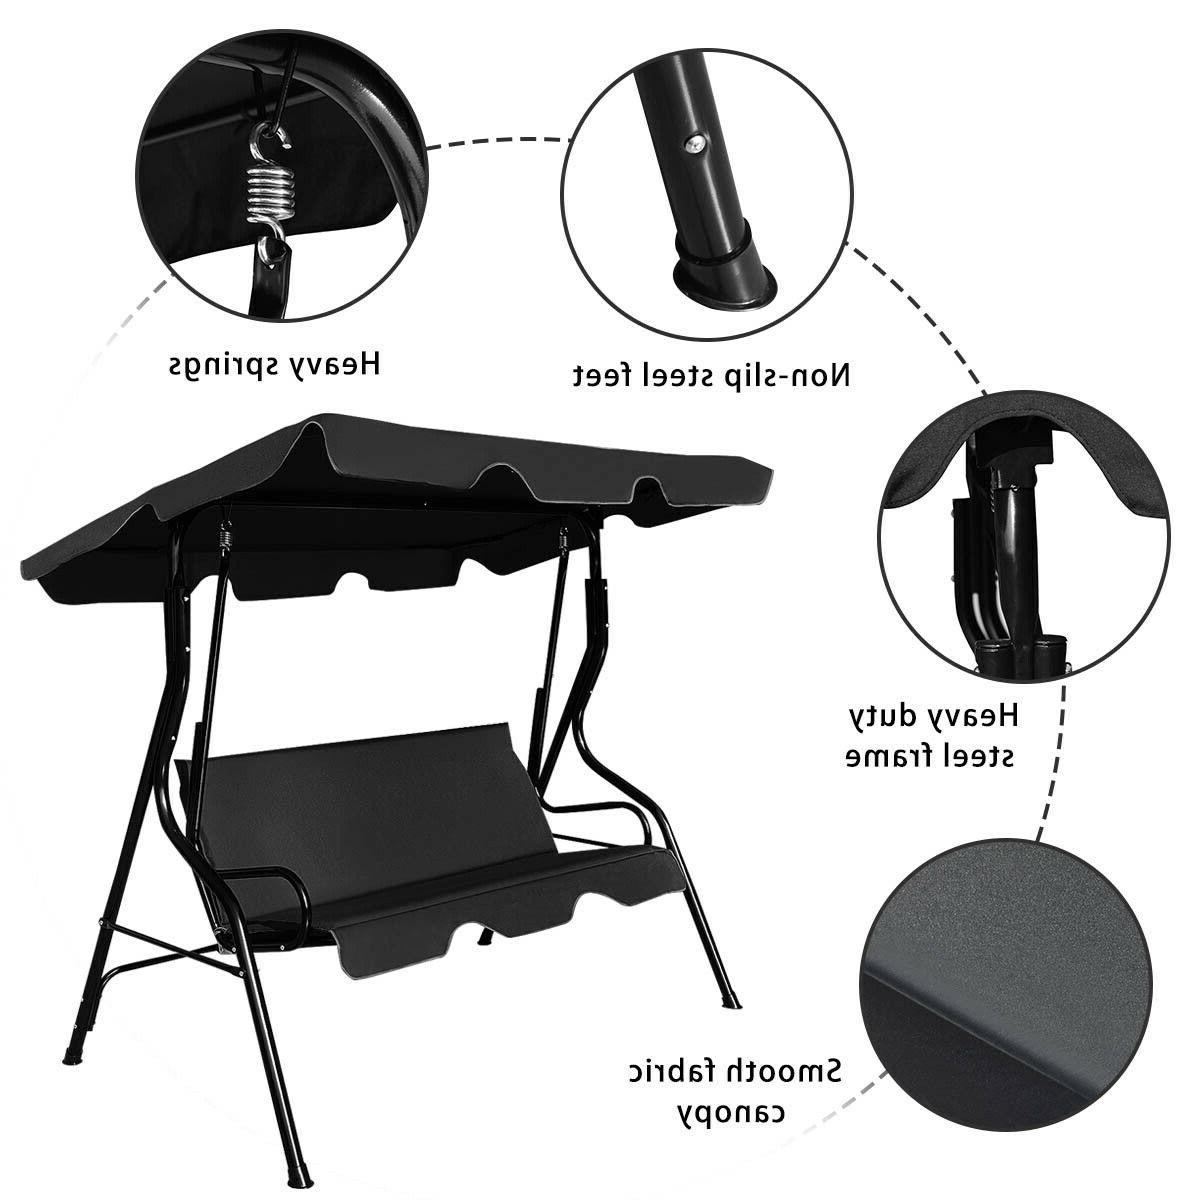 Preferred 3 Seats Patio Canopy Swing Gliders Hammock Cushioned Steel Frame In Costway 3 Seats Patio Canopy Swing Glider Hammock Cushioned (View 23 of 30)